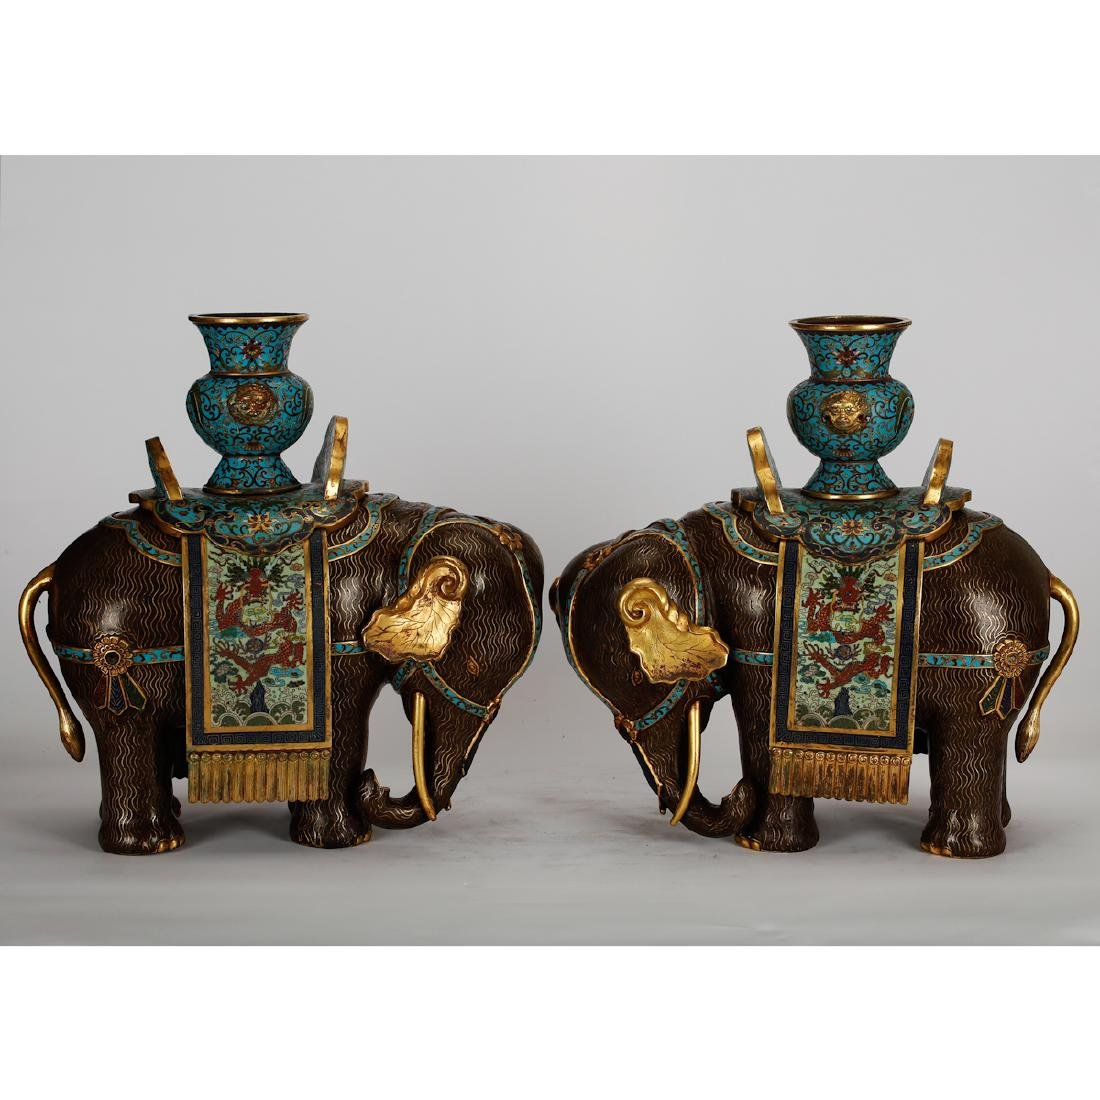 CHINESE CLOISONNE ELEPHANTS, PAIR